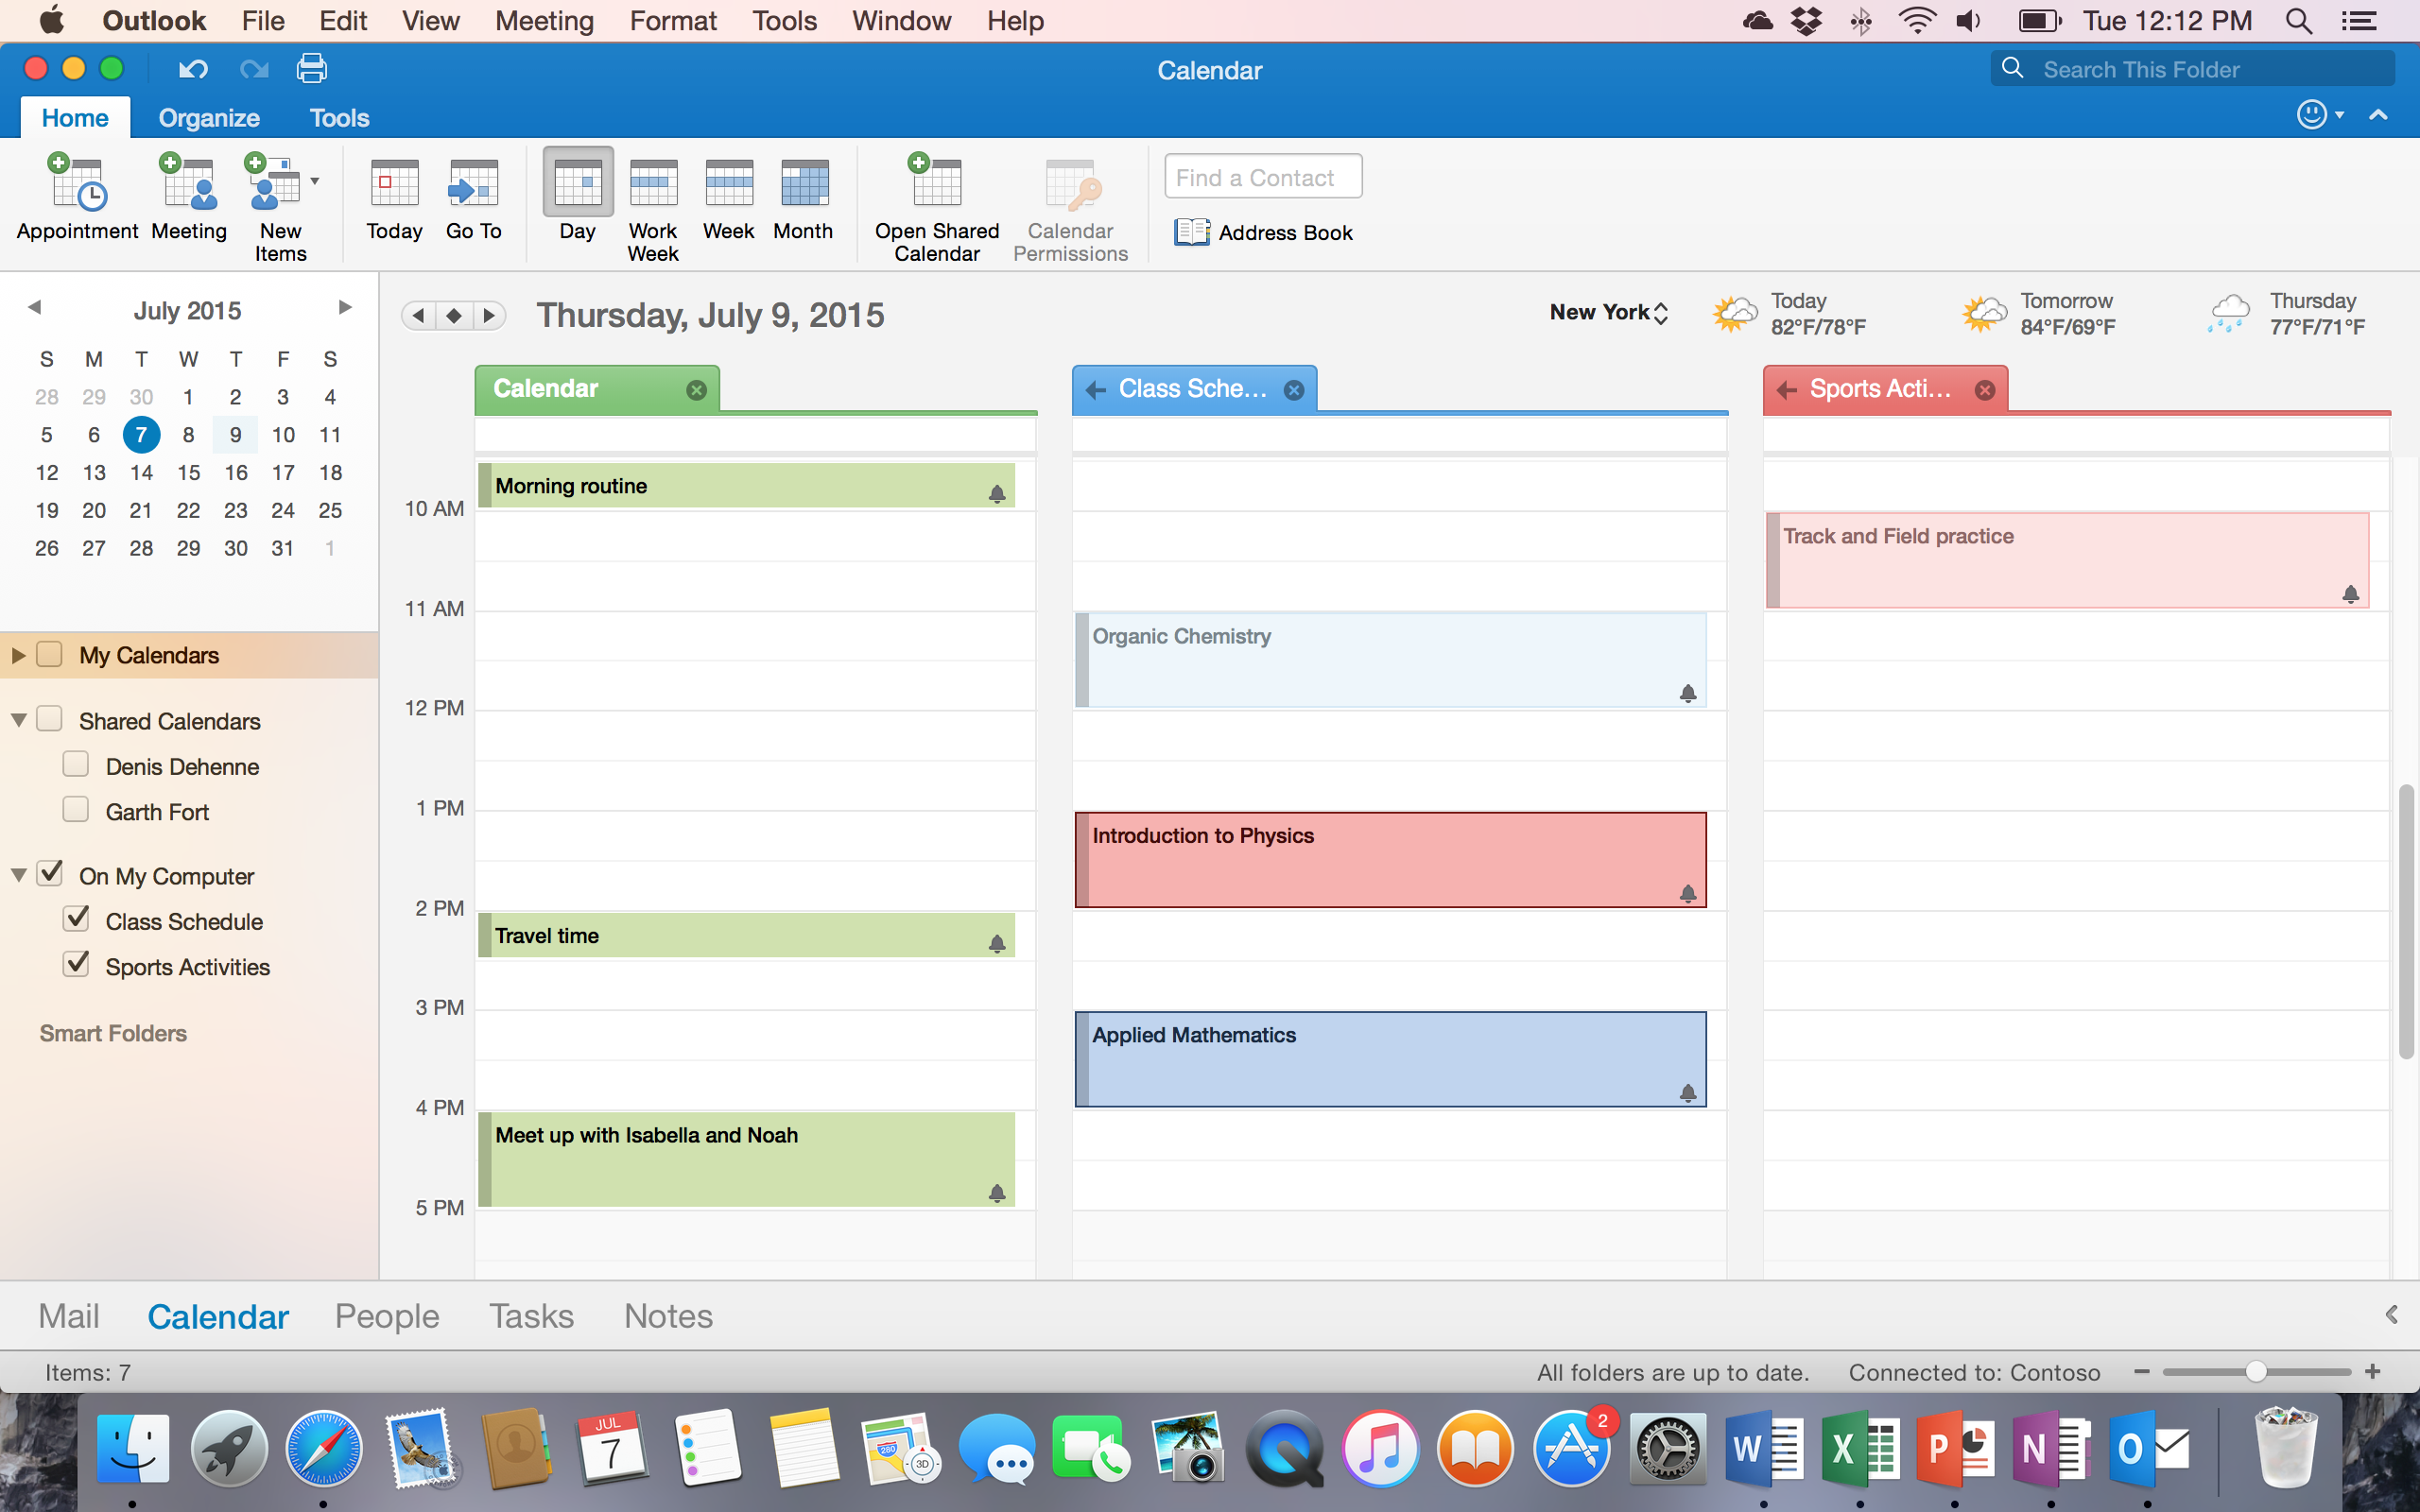 Outlook 2016 For Mac Calendar